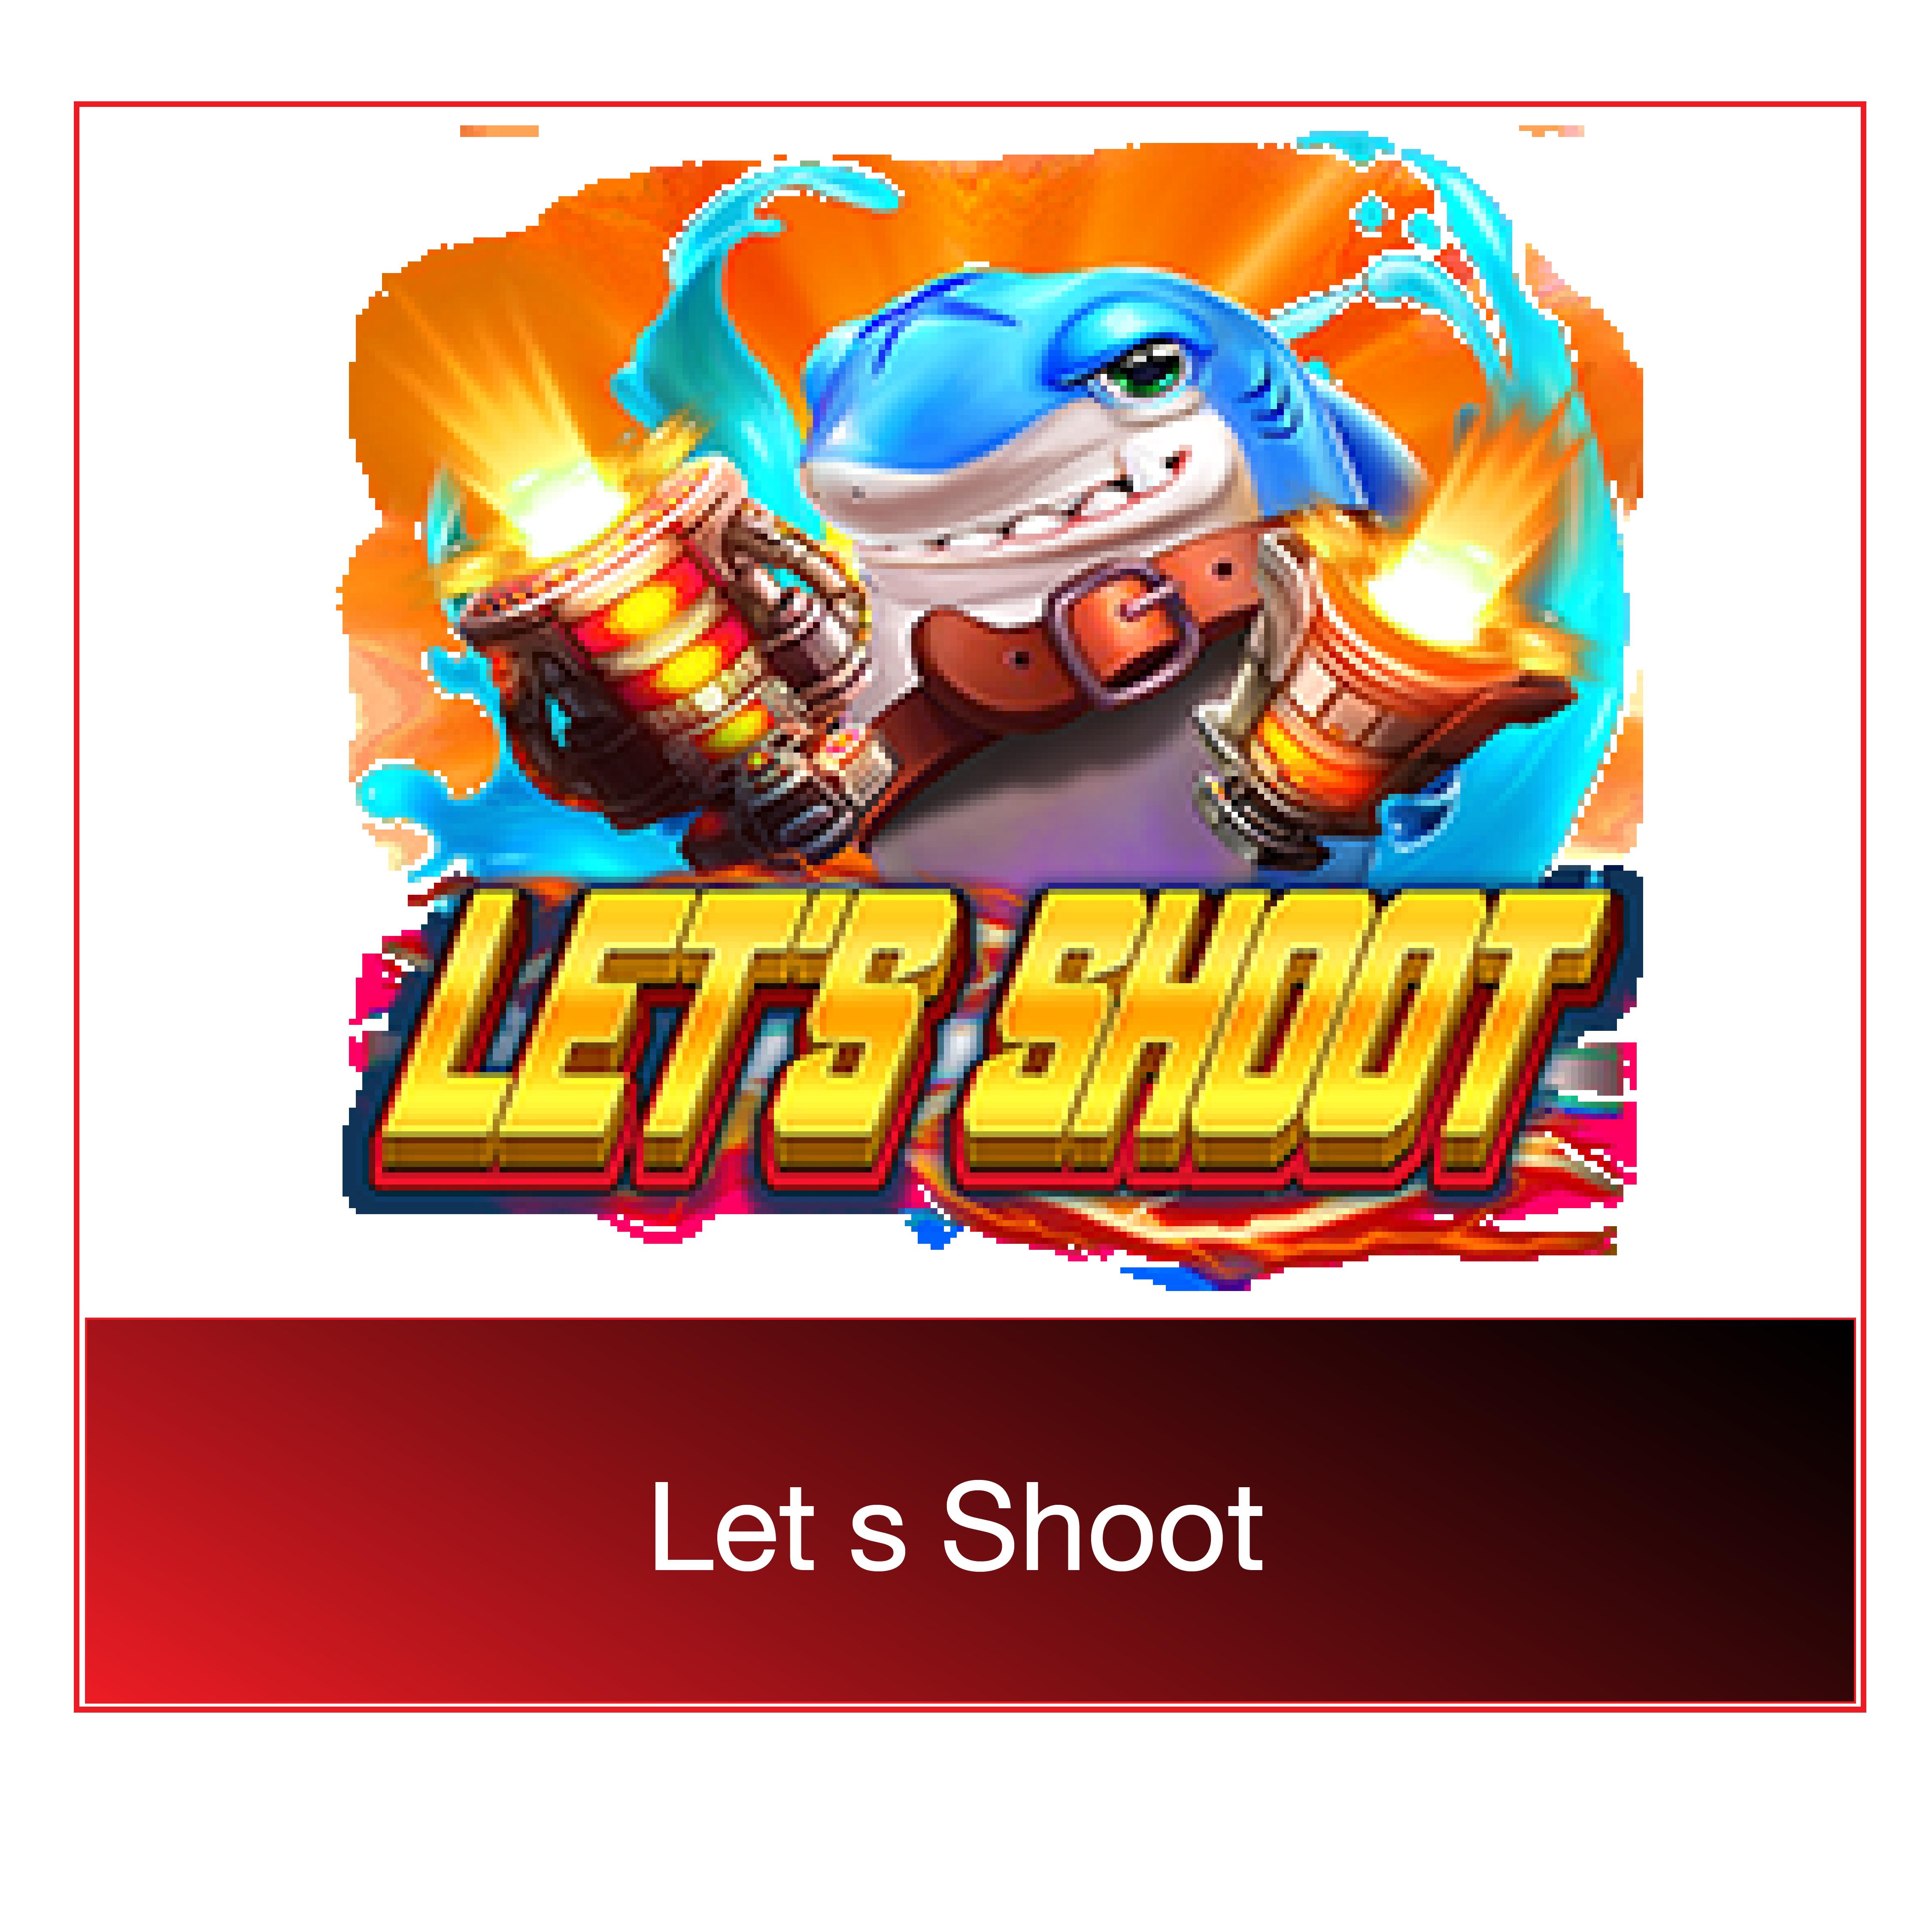 let's shoot demo เกมยิงปลา